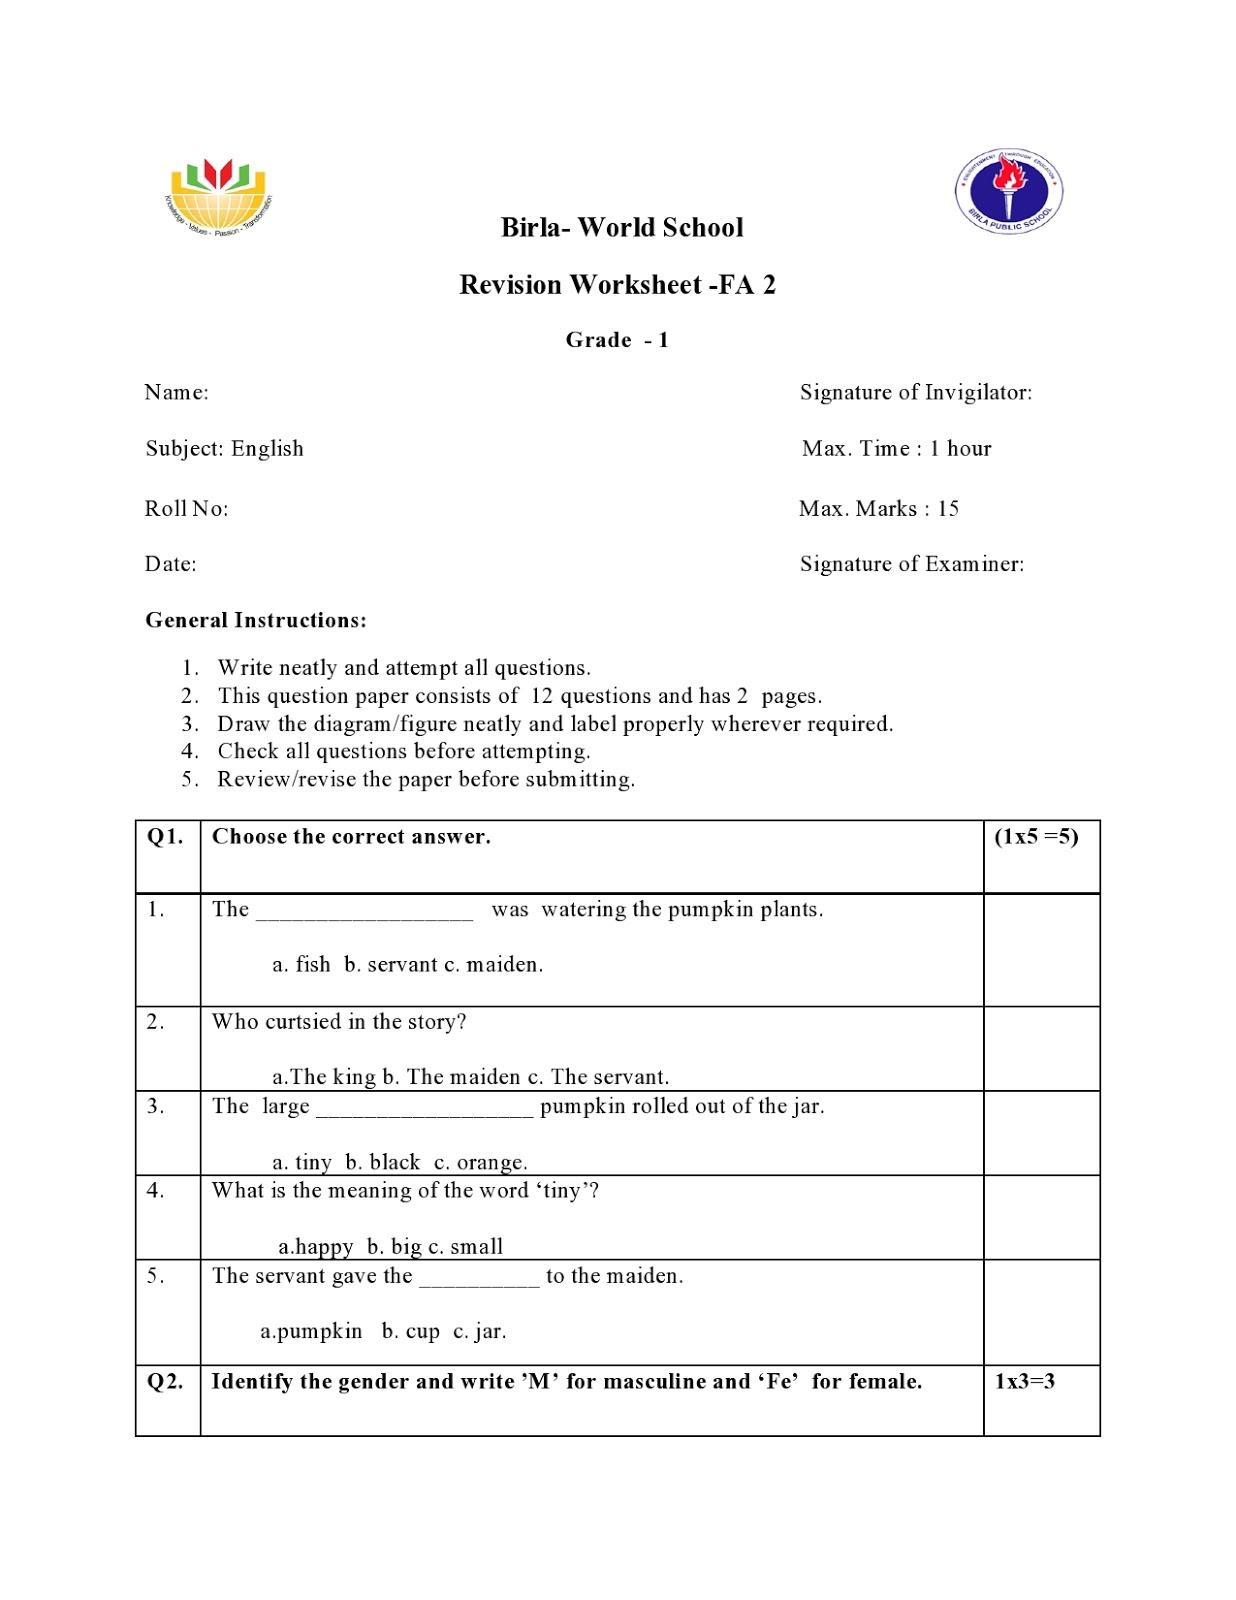 Birla World School Oman Revision Worksheet Sample Paper For Grade 1 B Amp D